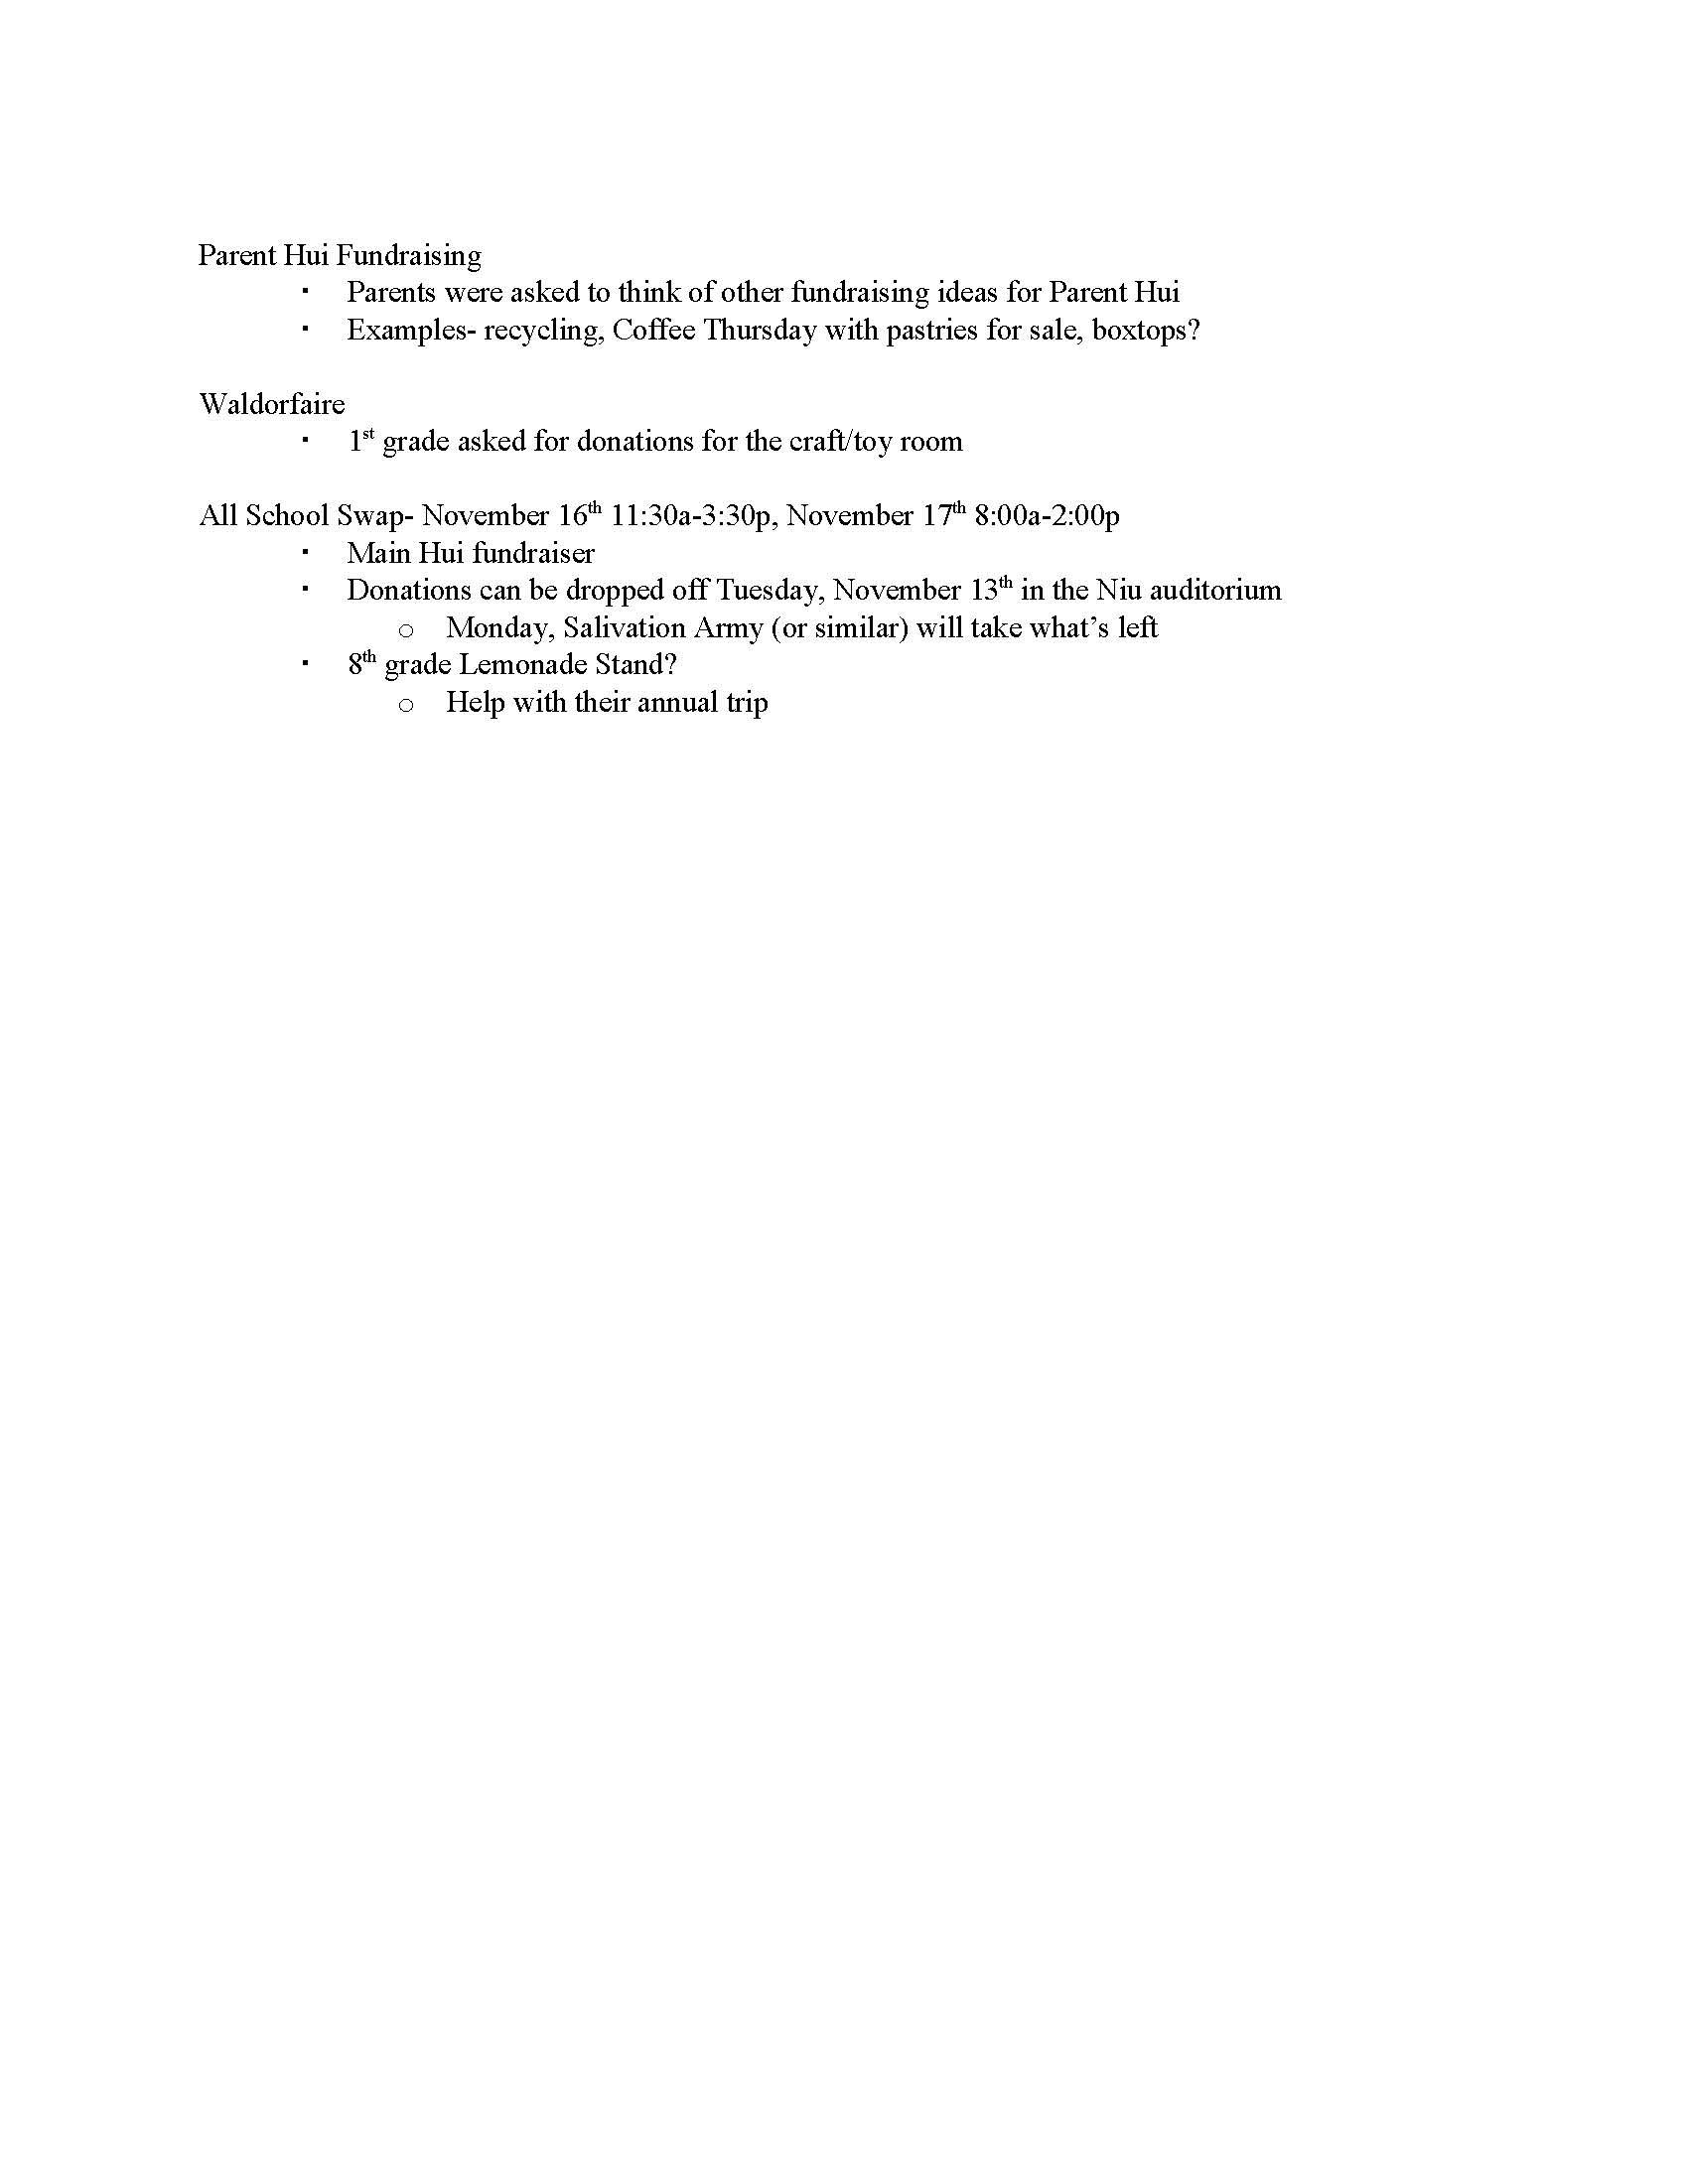 Parent Hui- Sept 13 Notes_Page_2.jpg